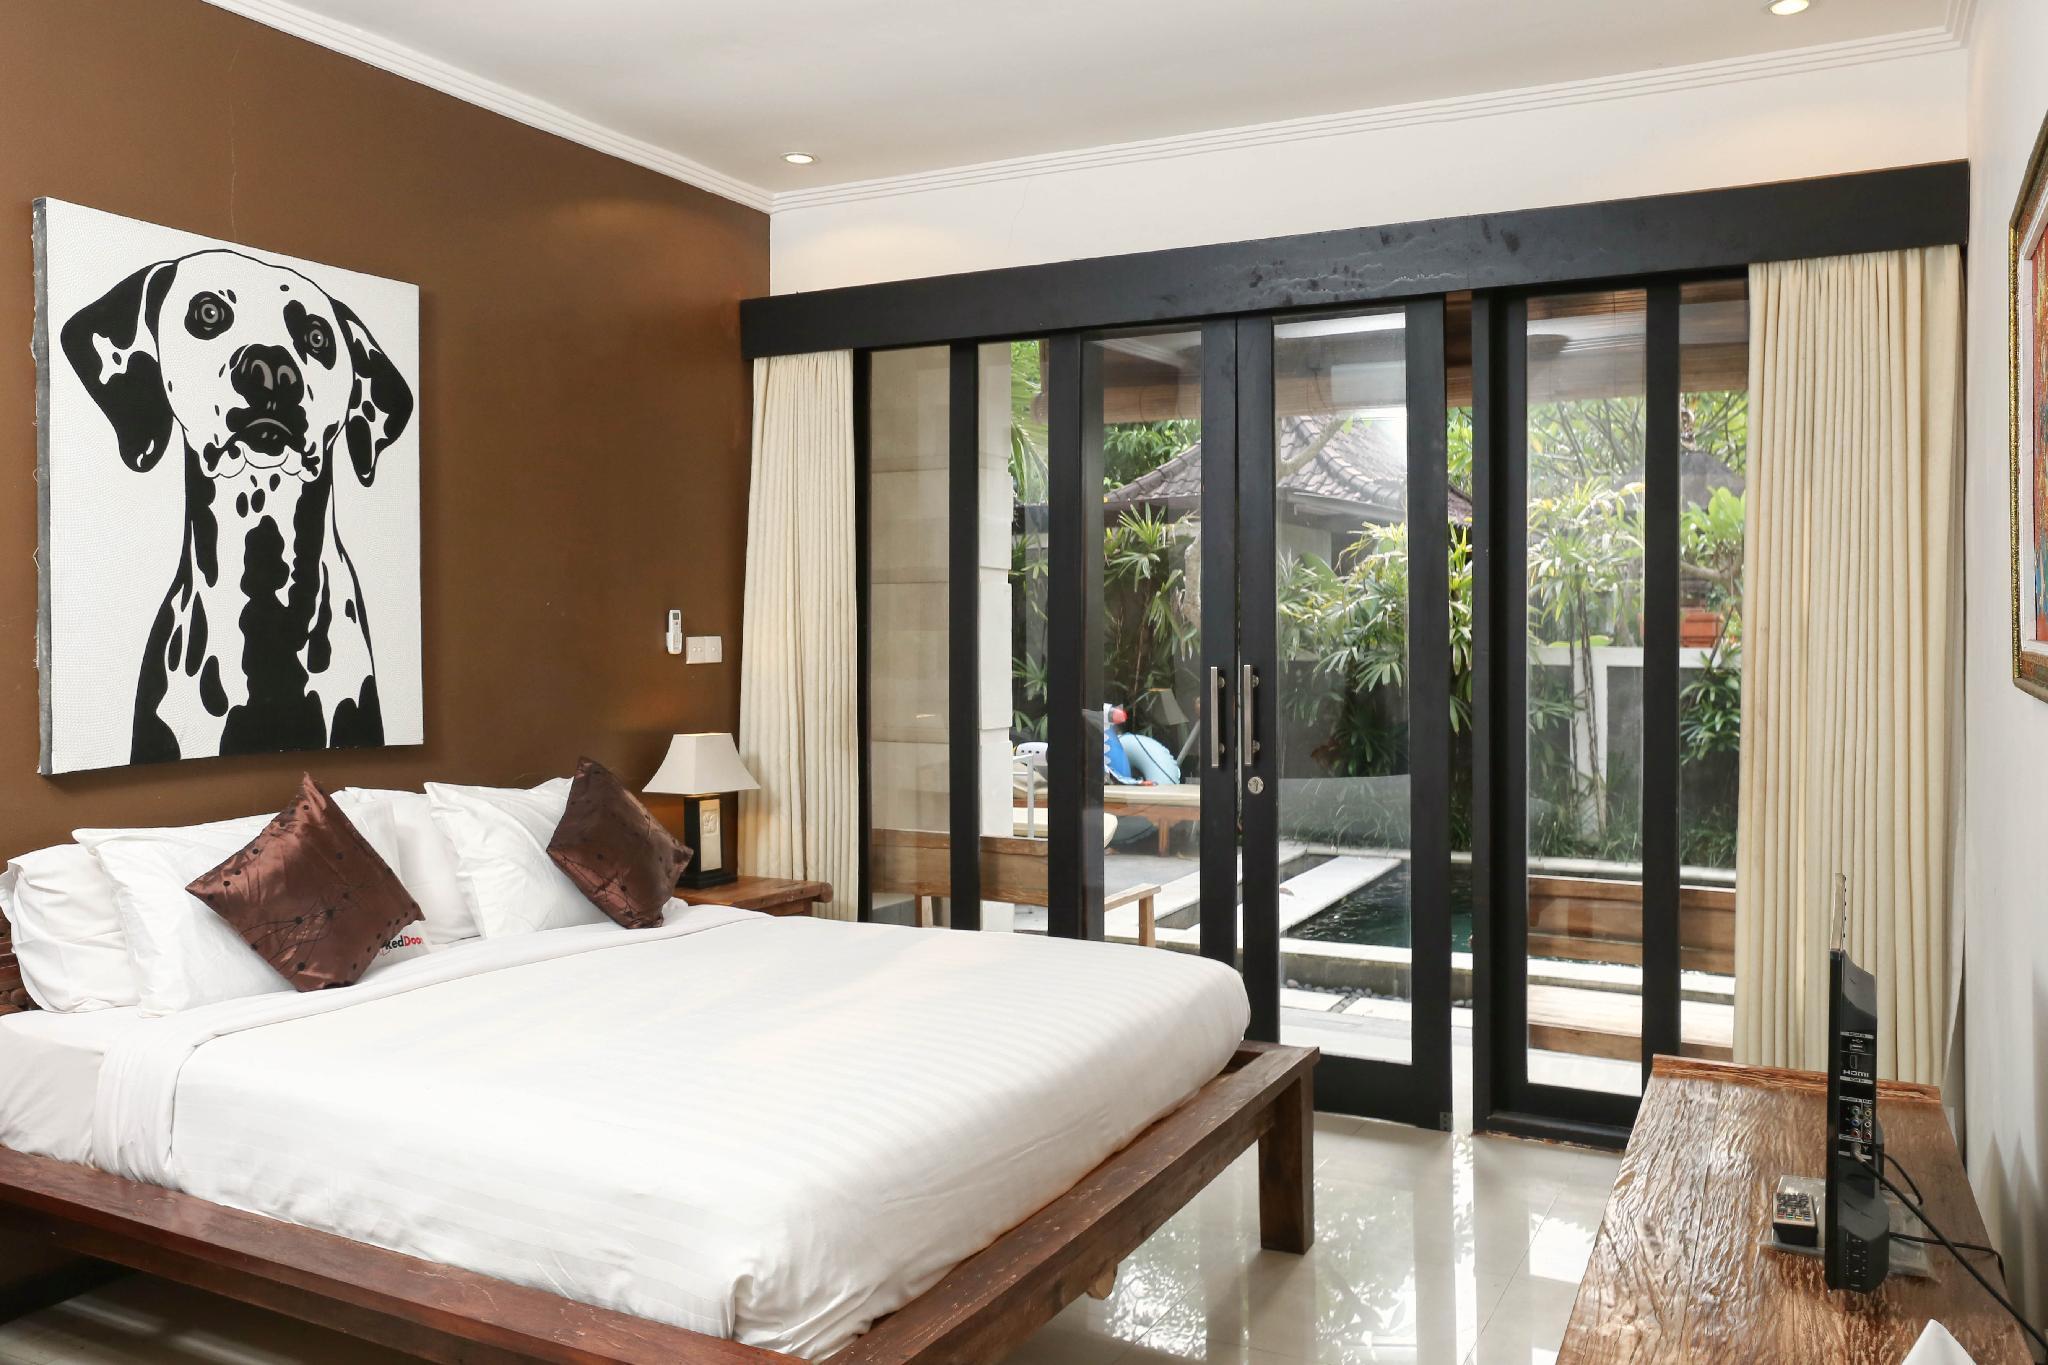 Hotel RedDoorz @ Kerobokan Canggu 2 - Located at Van Mandiri Guest House, Jalan raya Kerobokan Banjar Campuhan, Kerobokan - Bali